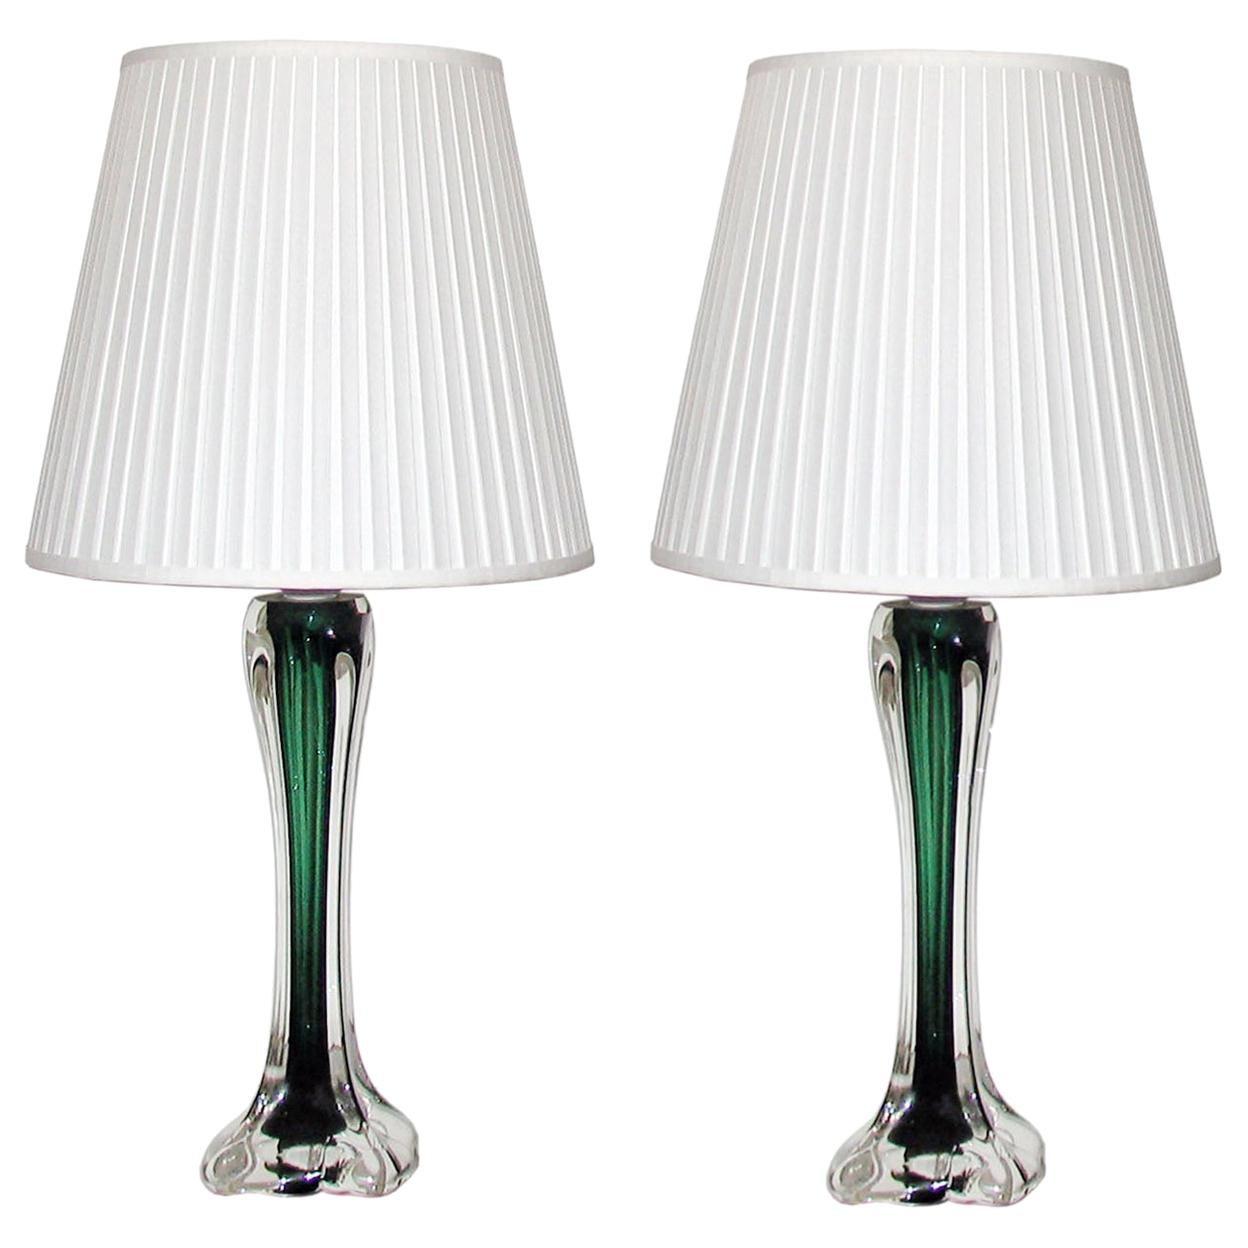 Mid-Century Modern Paul Kedelv Flygsfors Green Glass Table Lamps, Sweden, 1950s